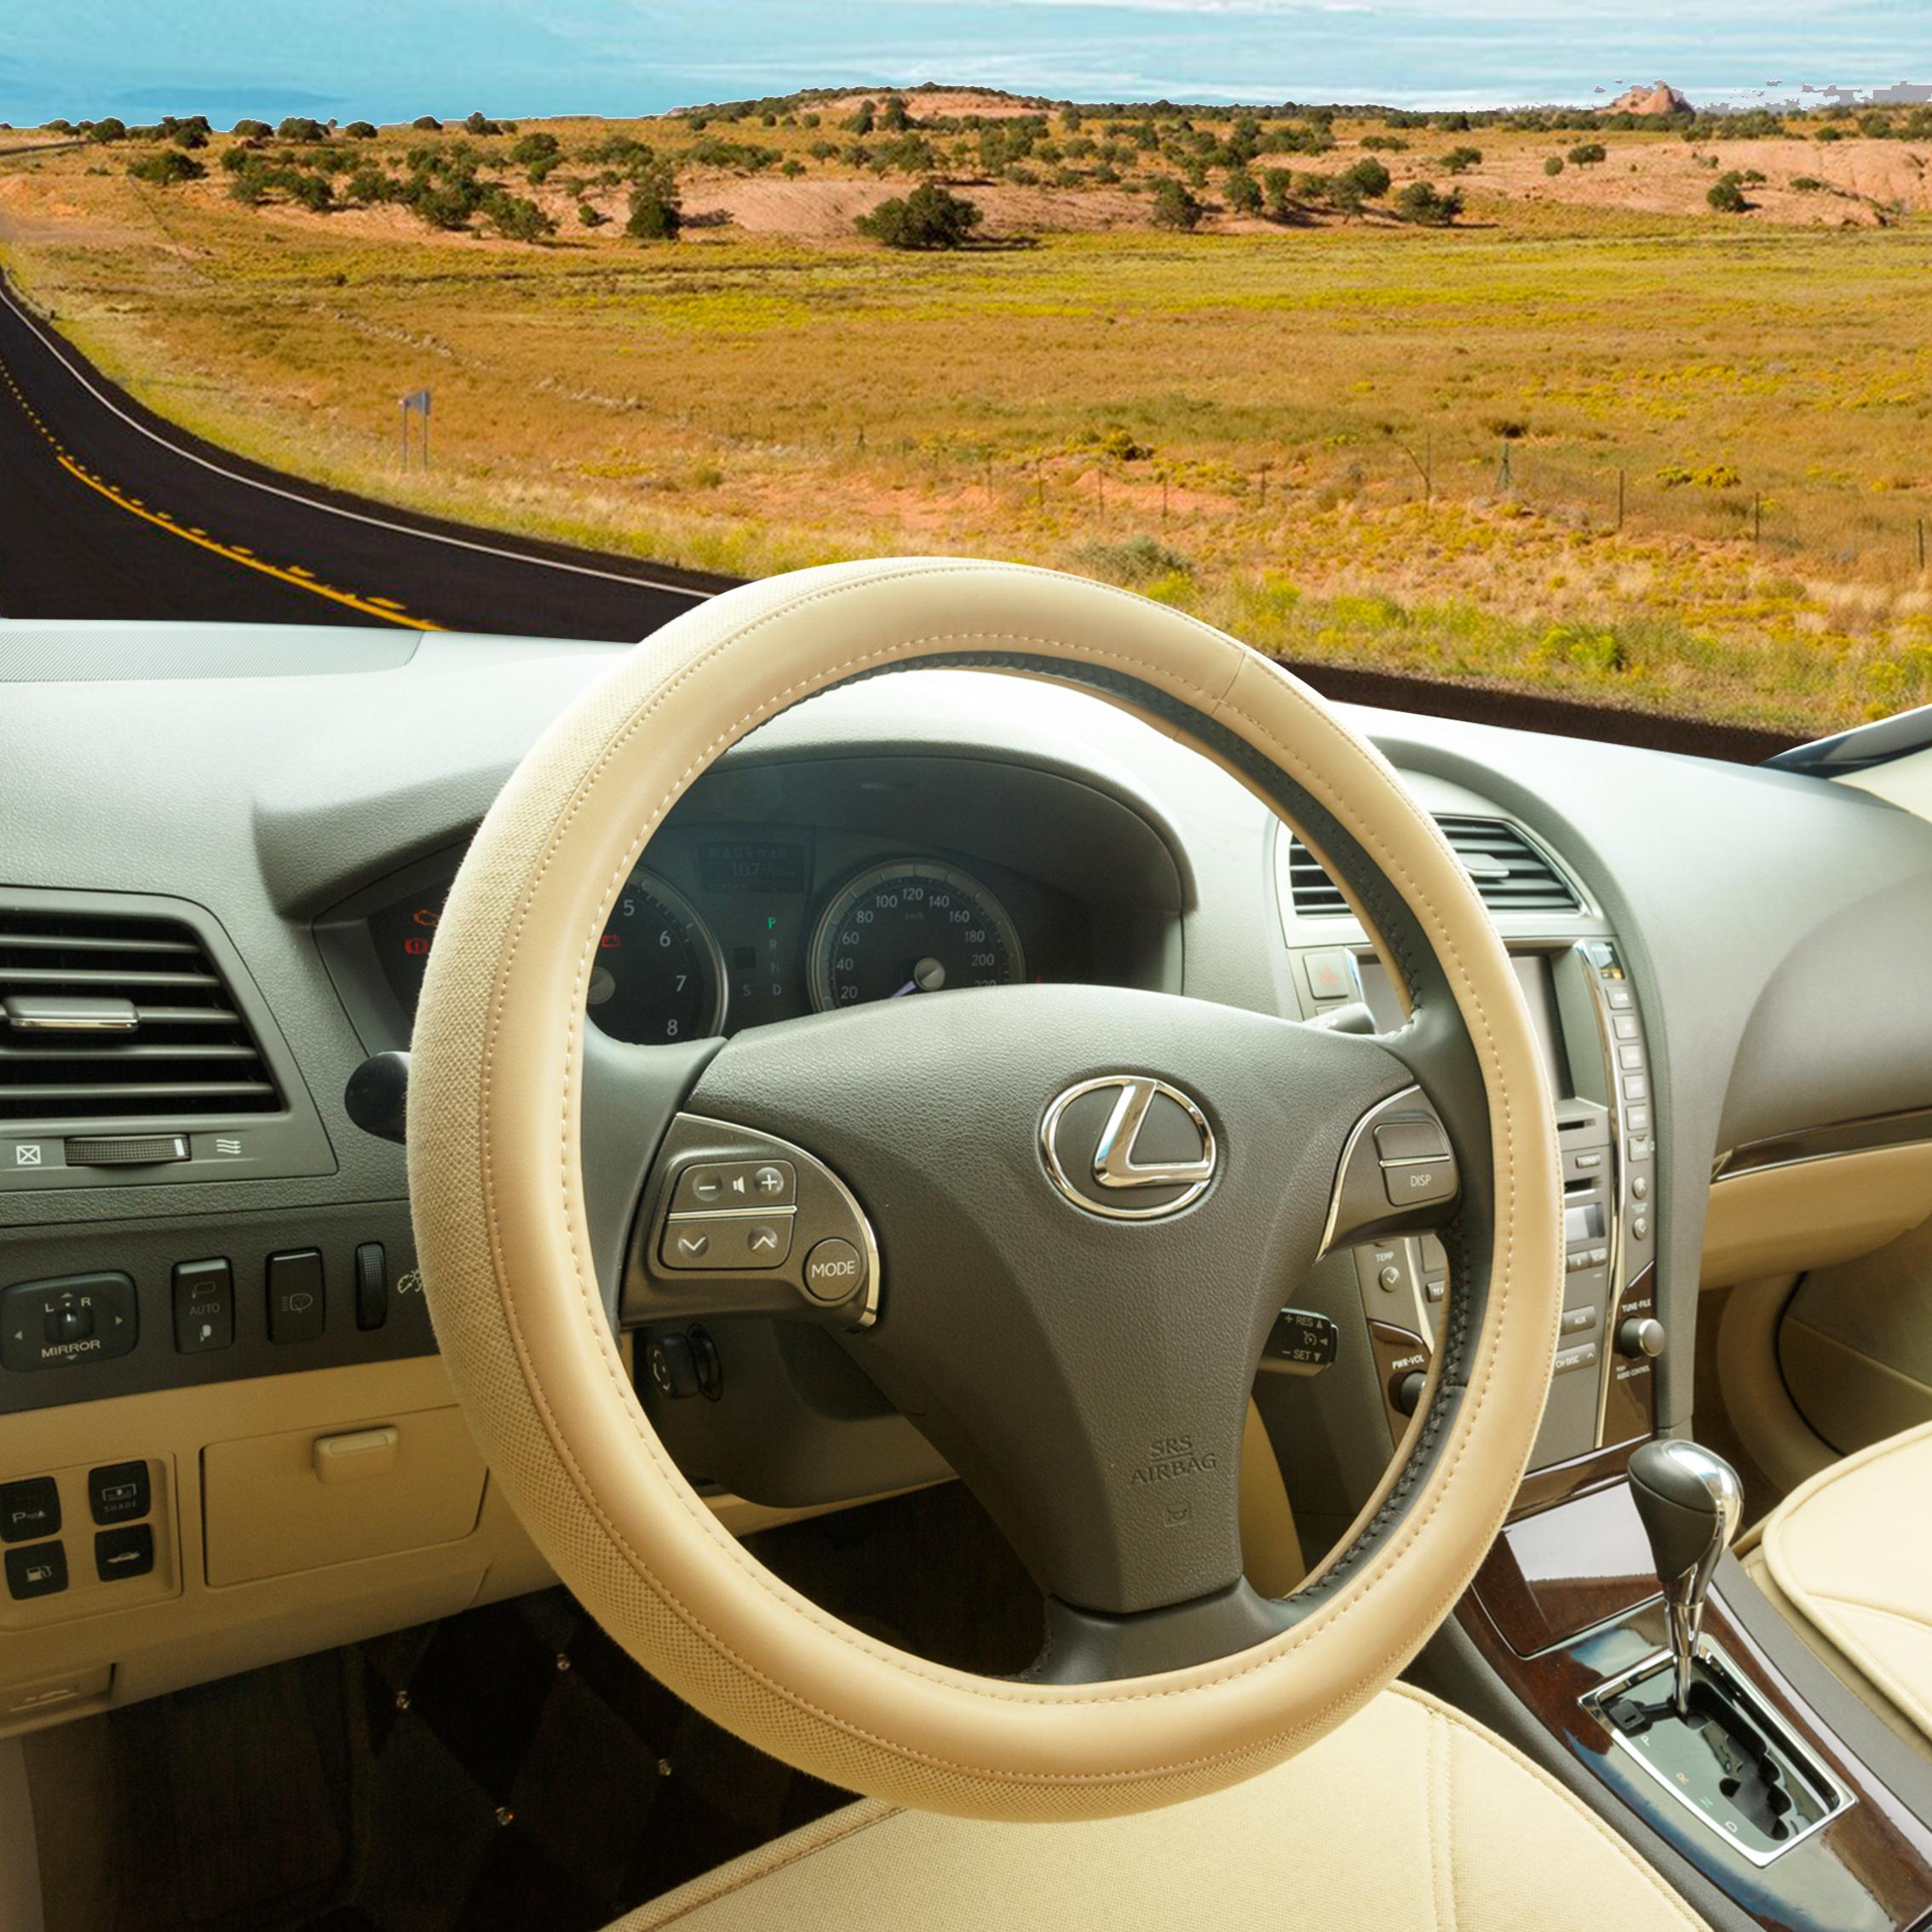 3 Brand Car Steering Wheel Cover For Volkswagen Passat Tiguan Lavida Bora Jetta Fawkes Leather Set(China (Mainland))